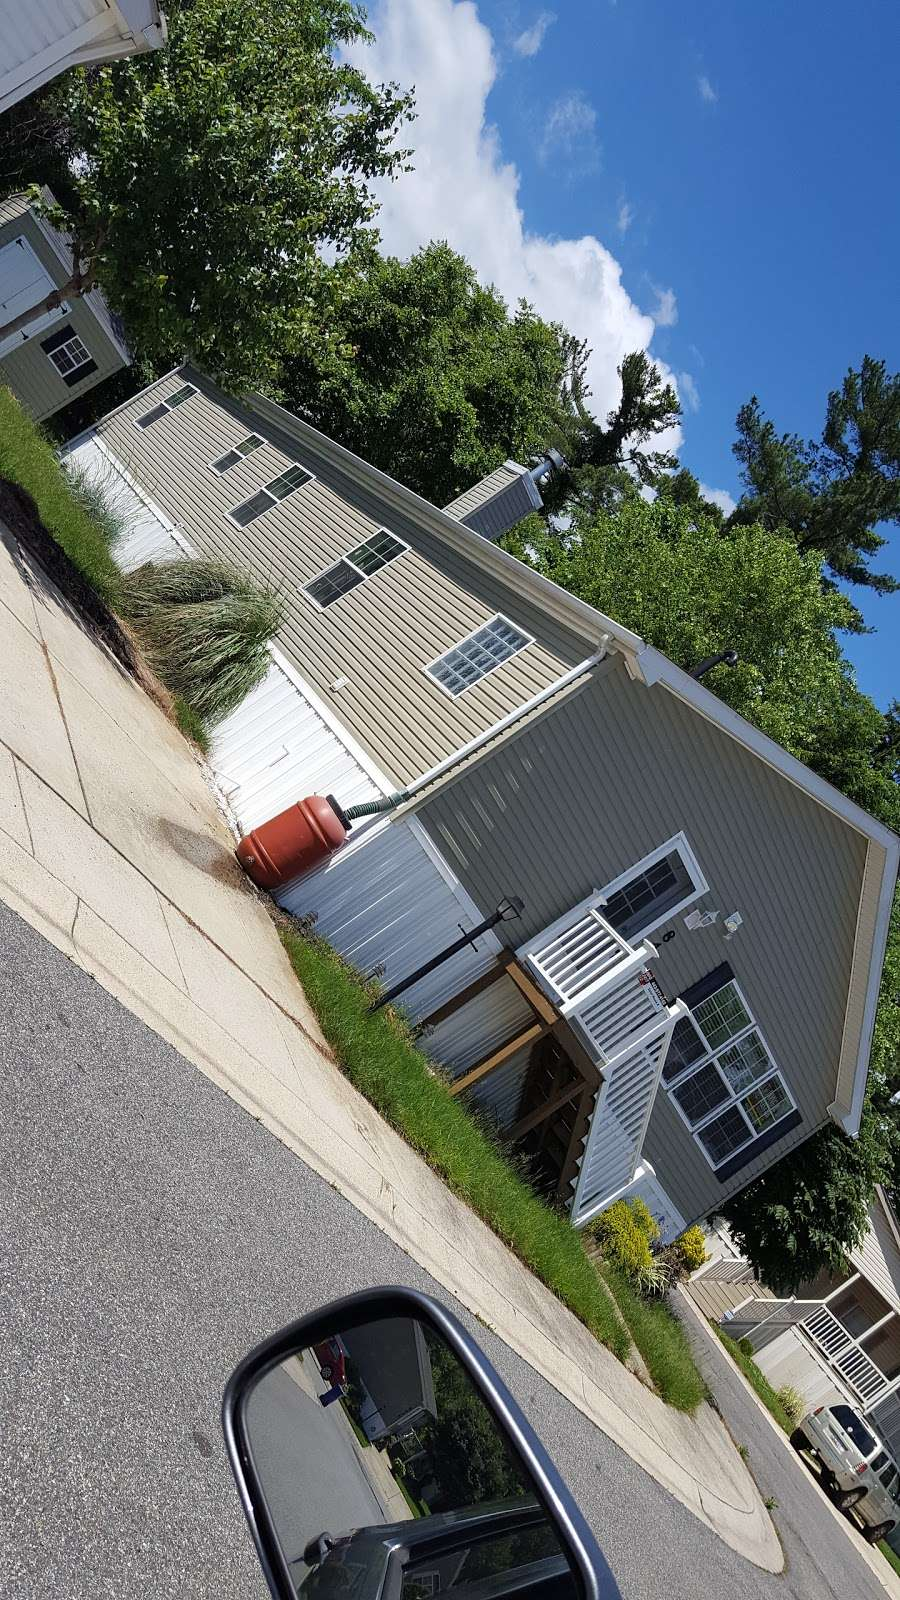 Brentwood Manor Inc - rv park  | Photo 2 of 5 | Address: 8291 Washington Blvd, Jessup, MD 20794, USA | Phone: (301) 498-0440